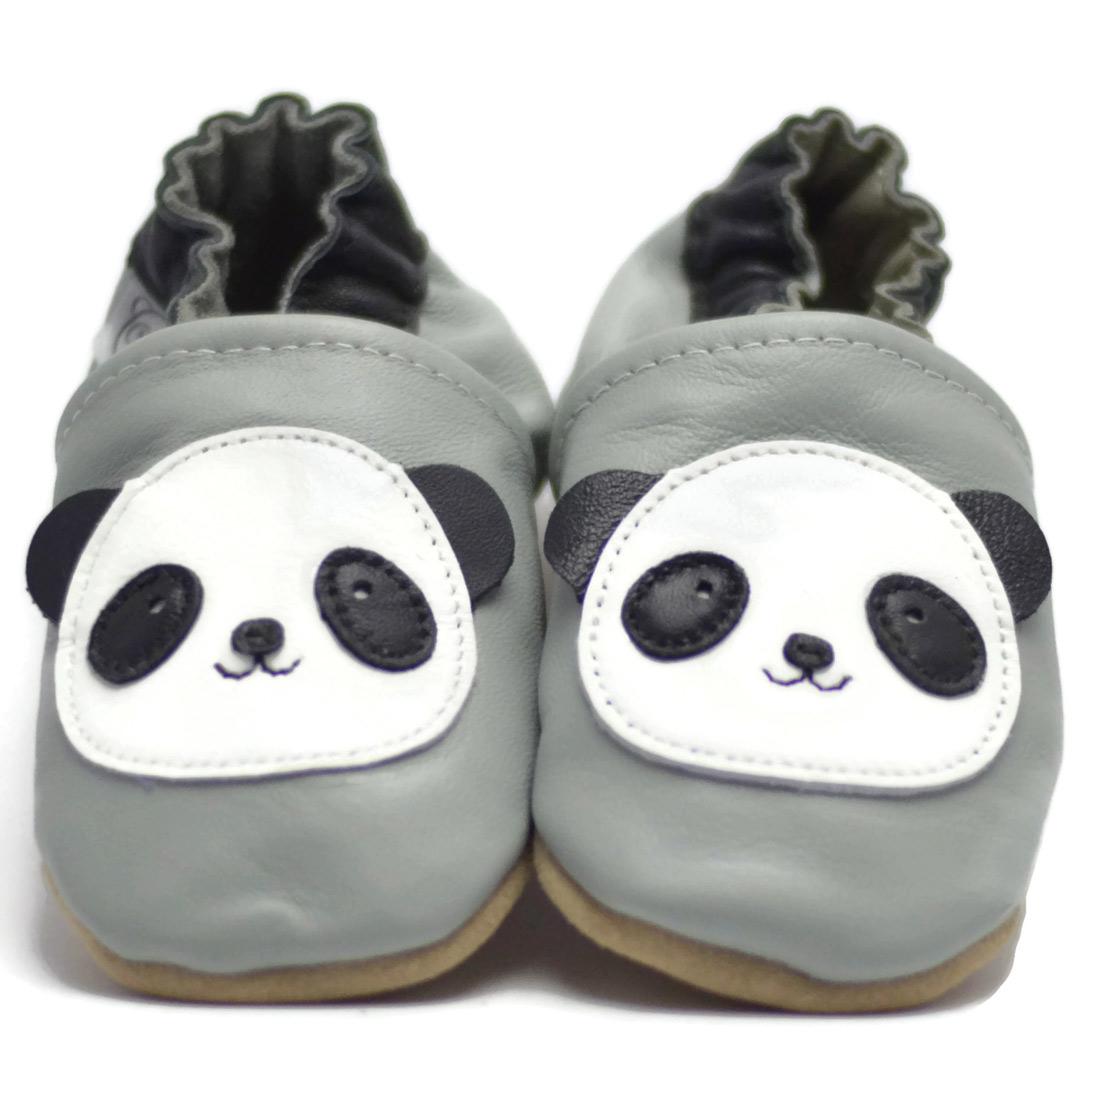 Chaussons ENFANT Cuir Souple 12-18 mois panda R6GWa